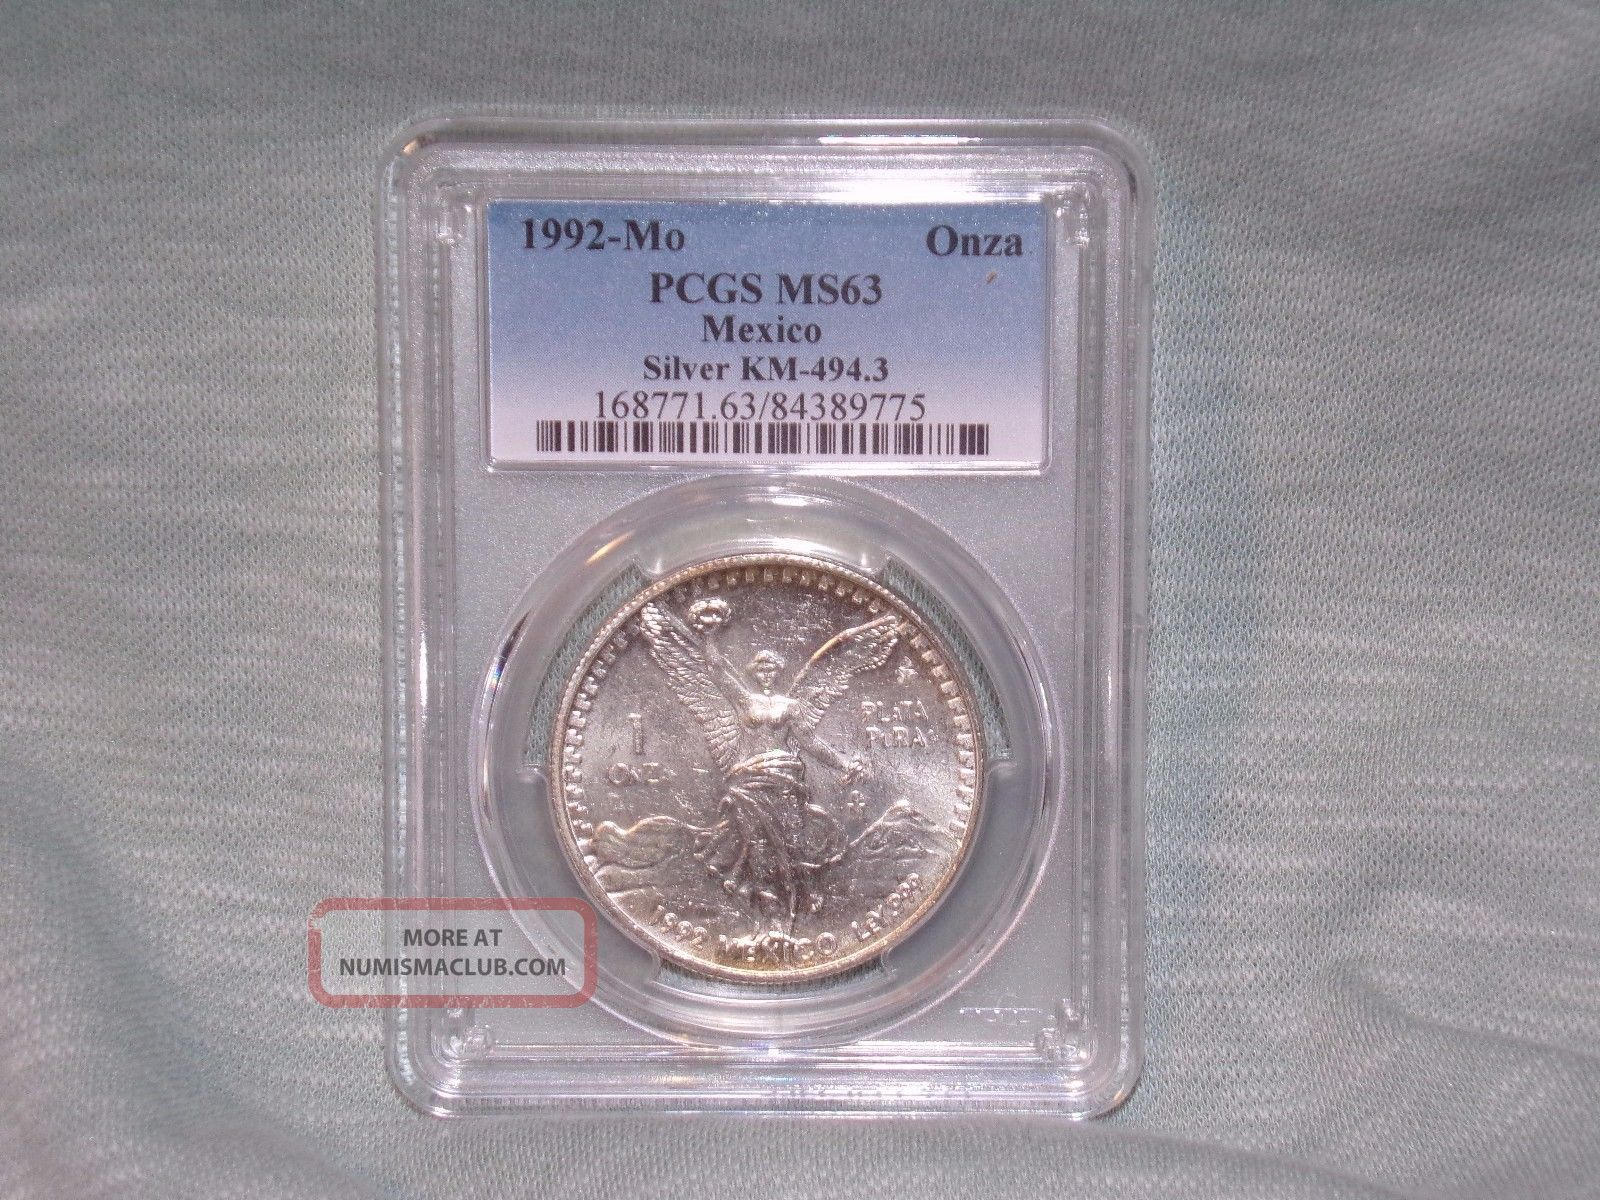 1992 - Mo Pcgs Ms63 1onza Silver Libertad